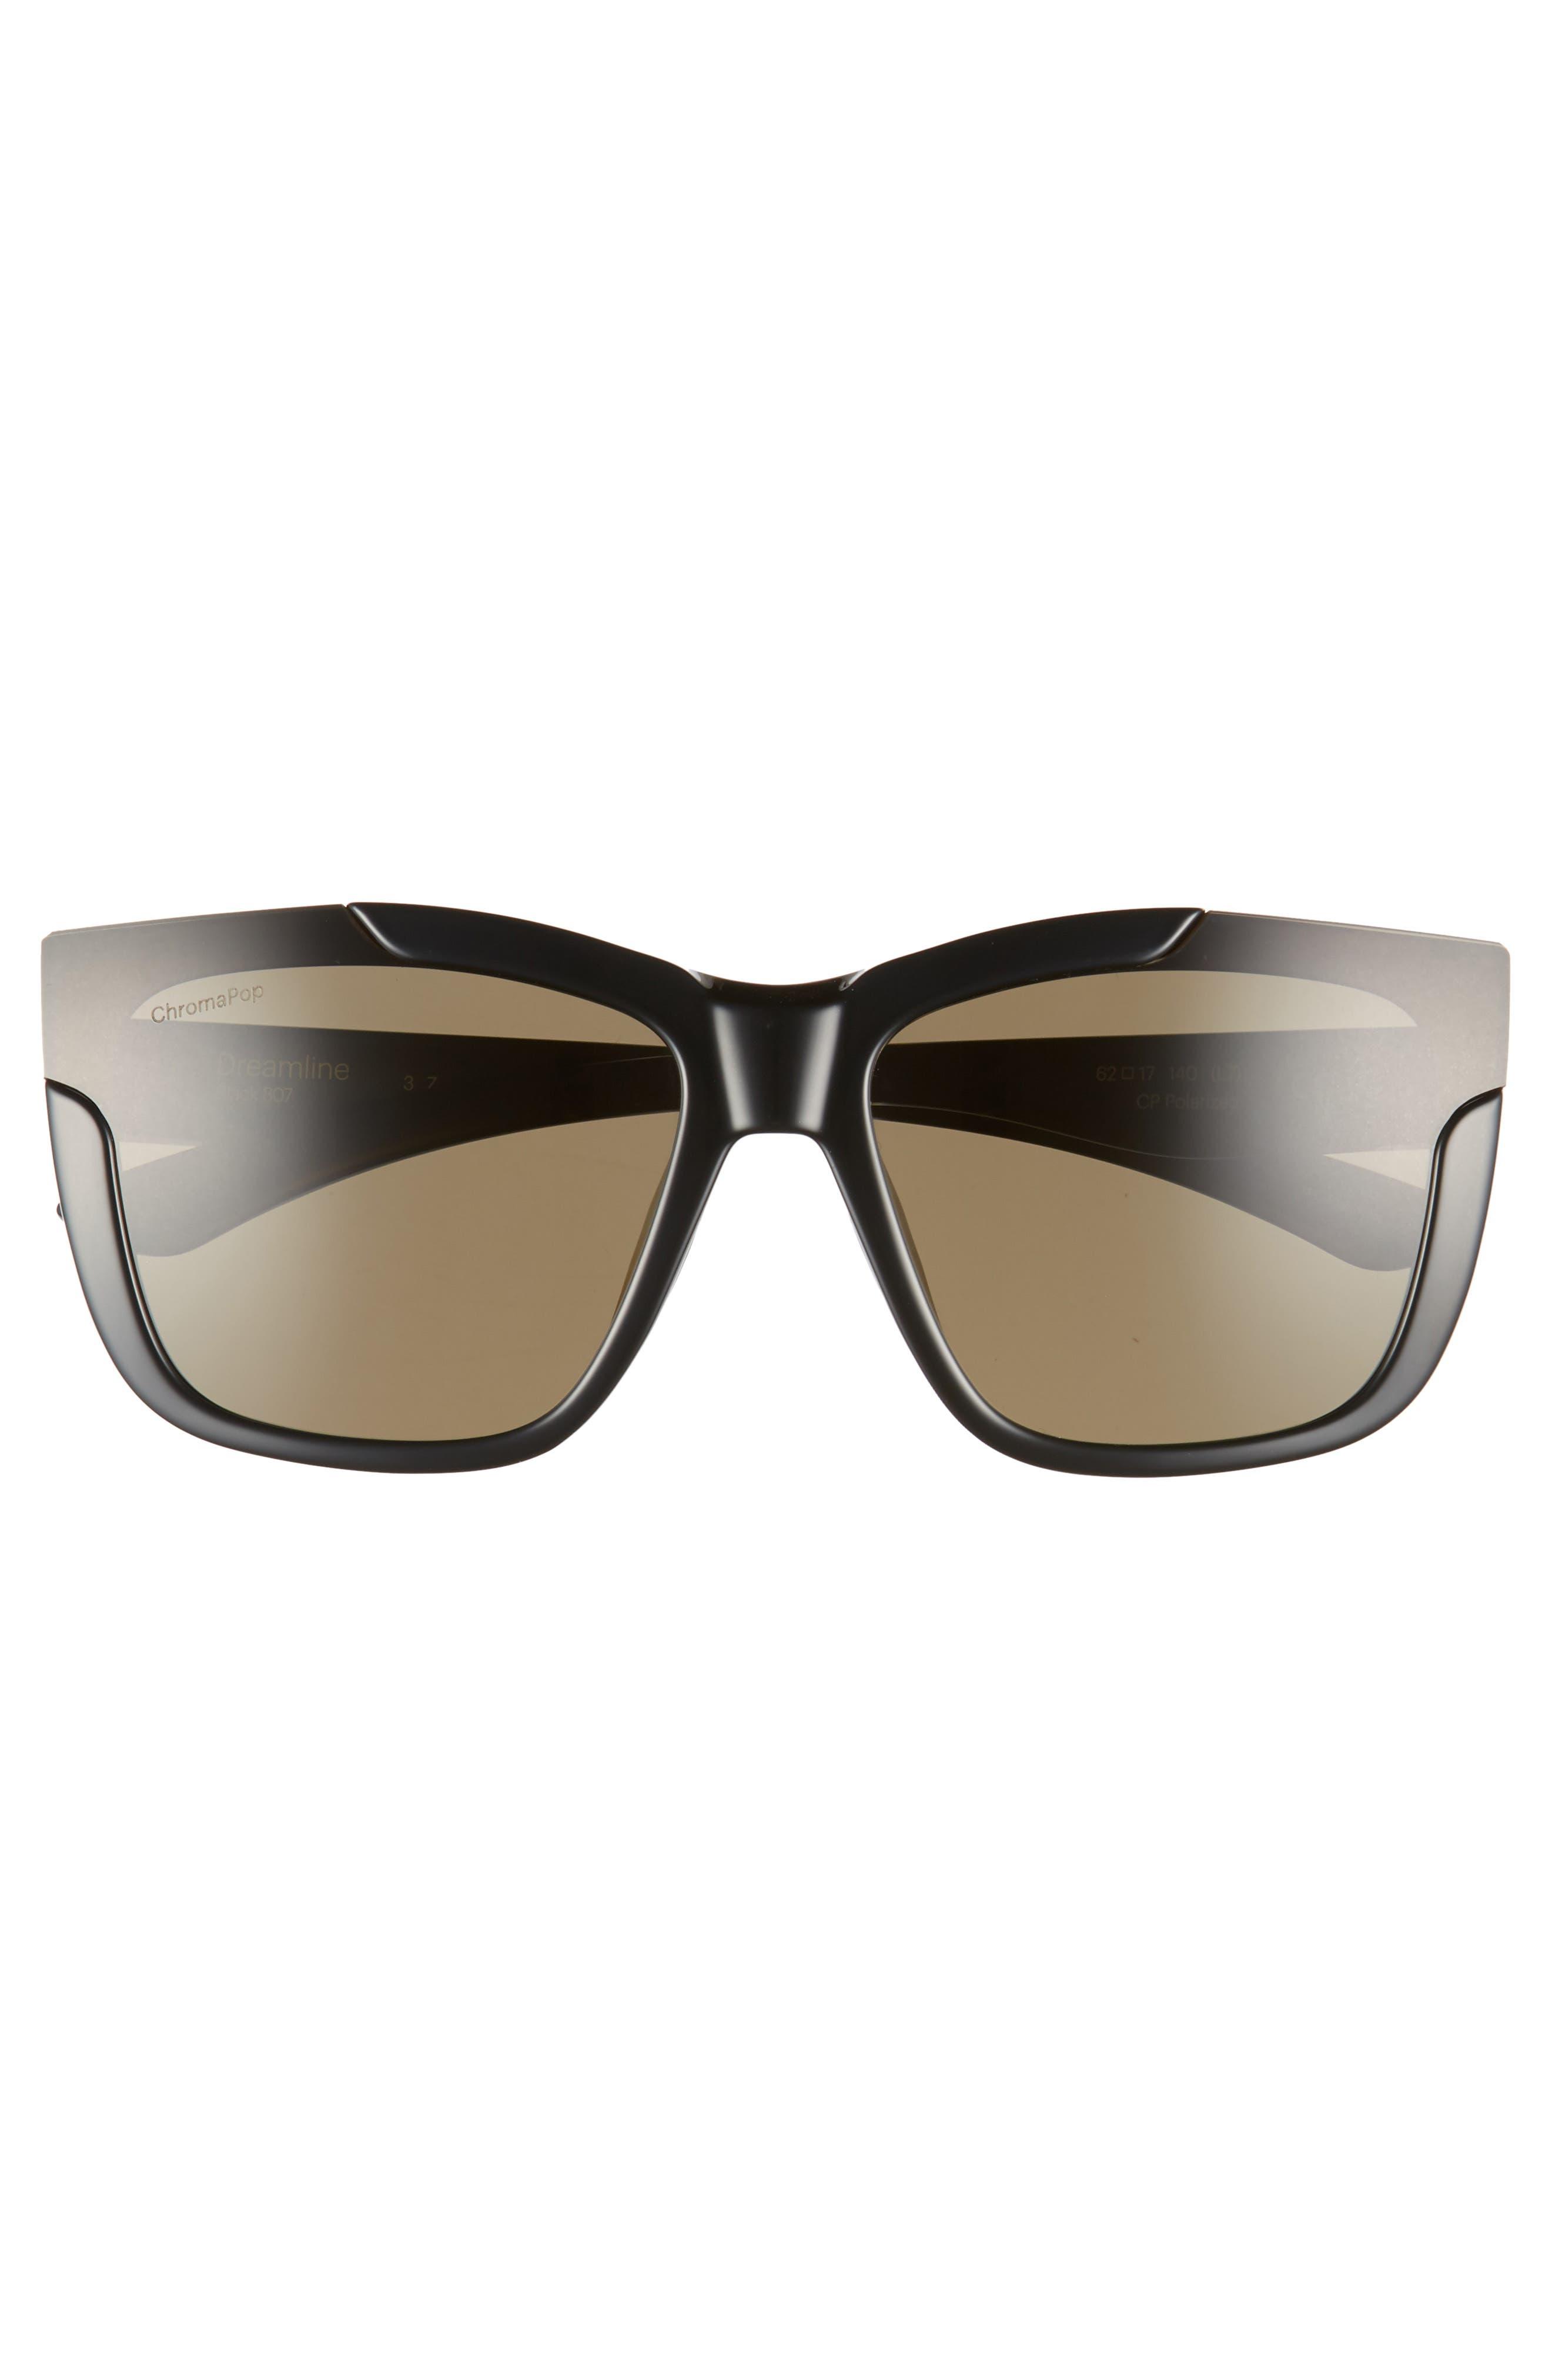 Dreamline 62mm Oversize Butterfly ChromaPop<sup>™</sup> Polarized Sunglasses,                             Alternate thumbnail 3, color,                             BLACK